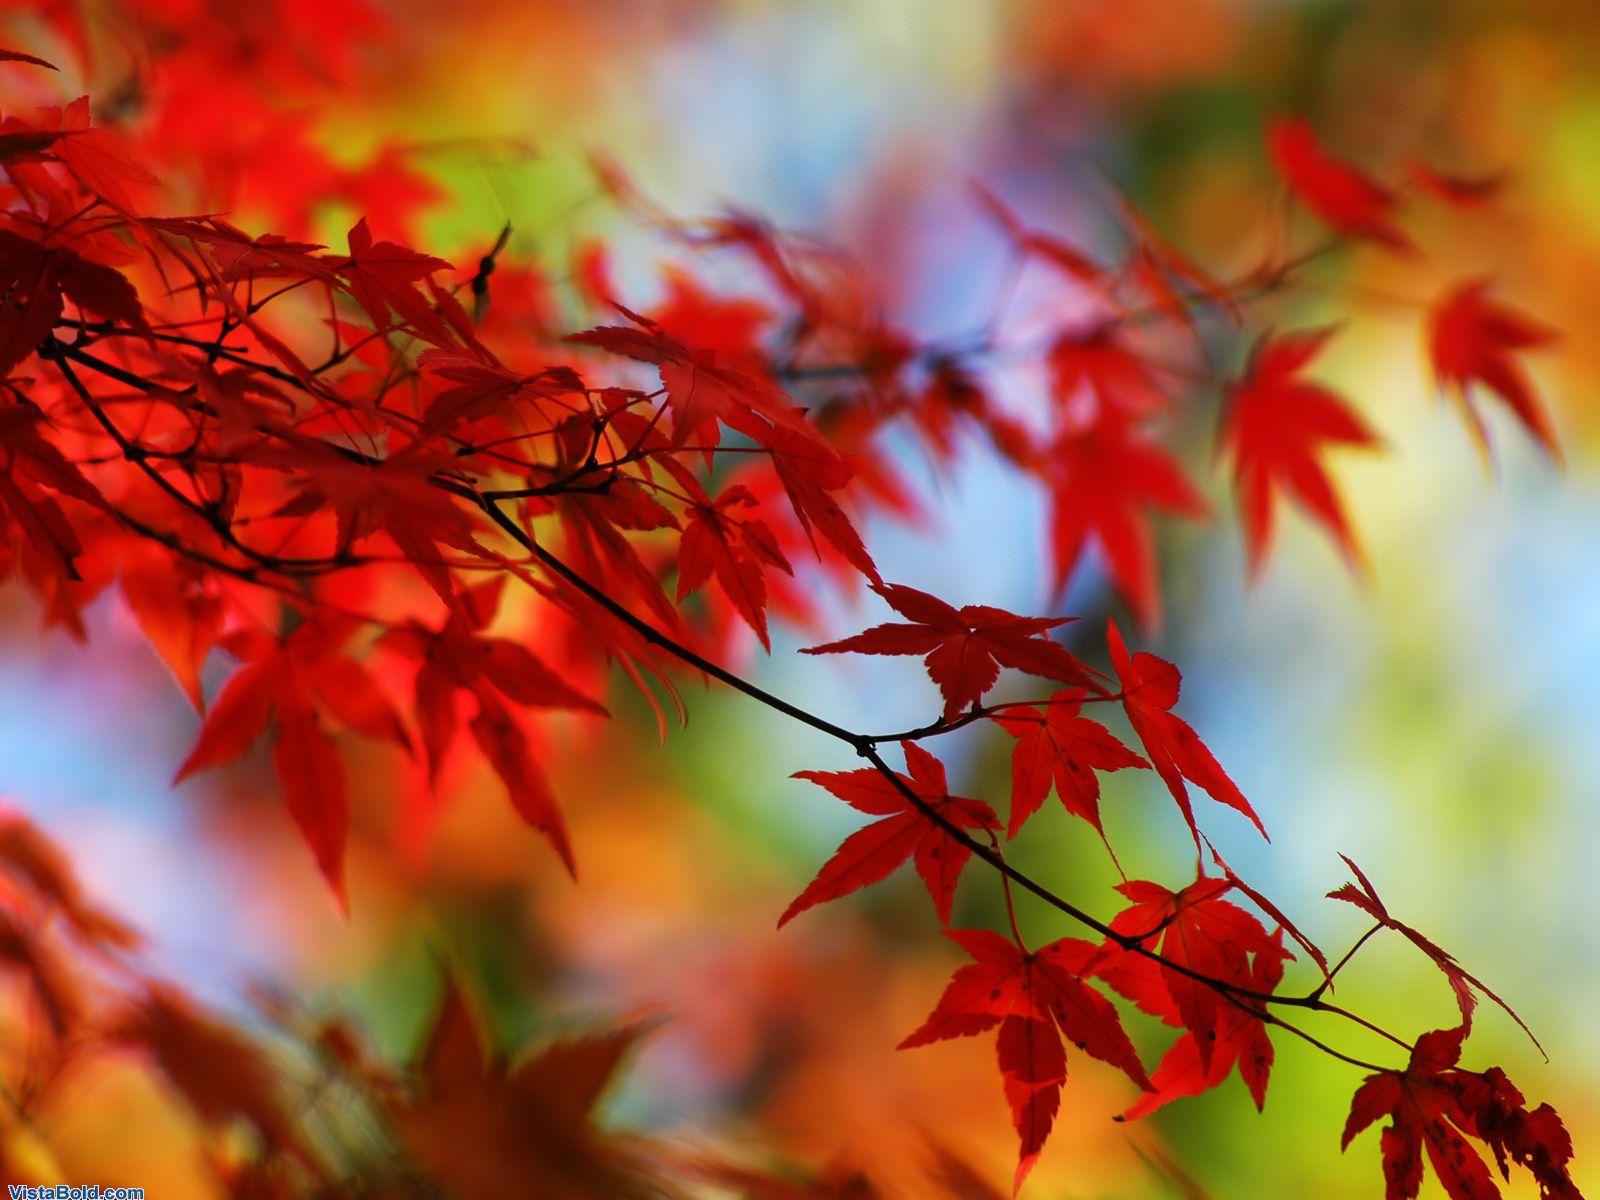 The best top autumn desktop wallpapers 15 En Güzel Sonbahar HD Duvar Kağıtları